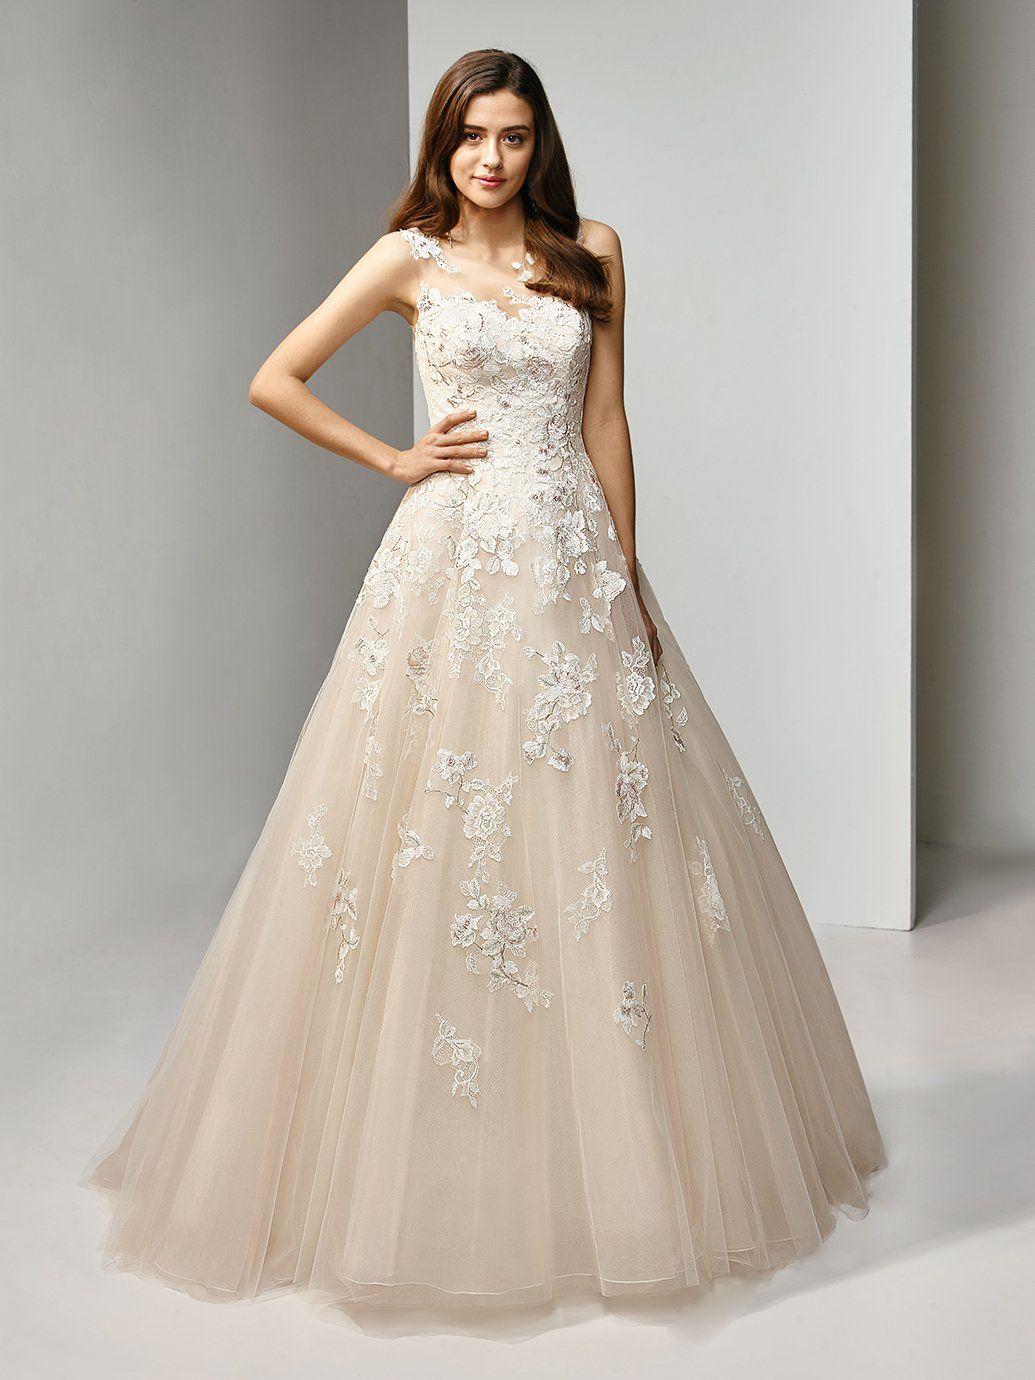 bbb4f97e DESTINA 2019 brudekjole i 2019   Fairytale wedding   Kjole og Brudekjole